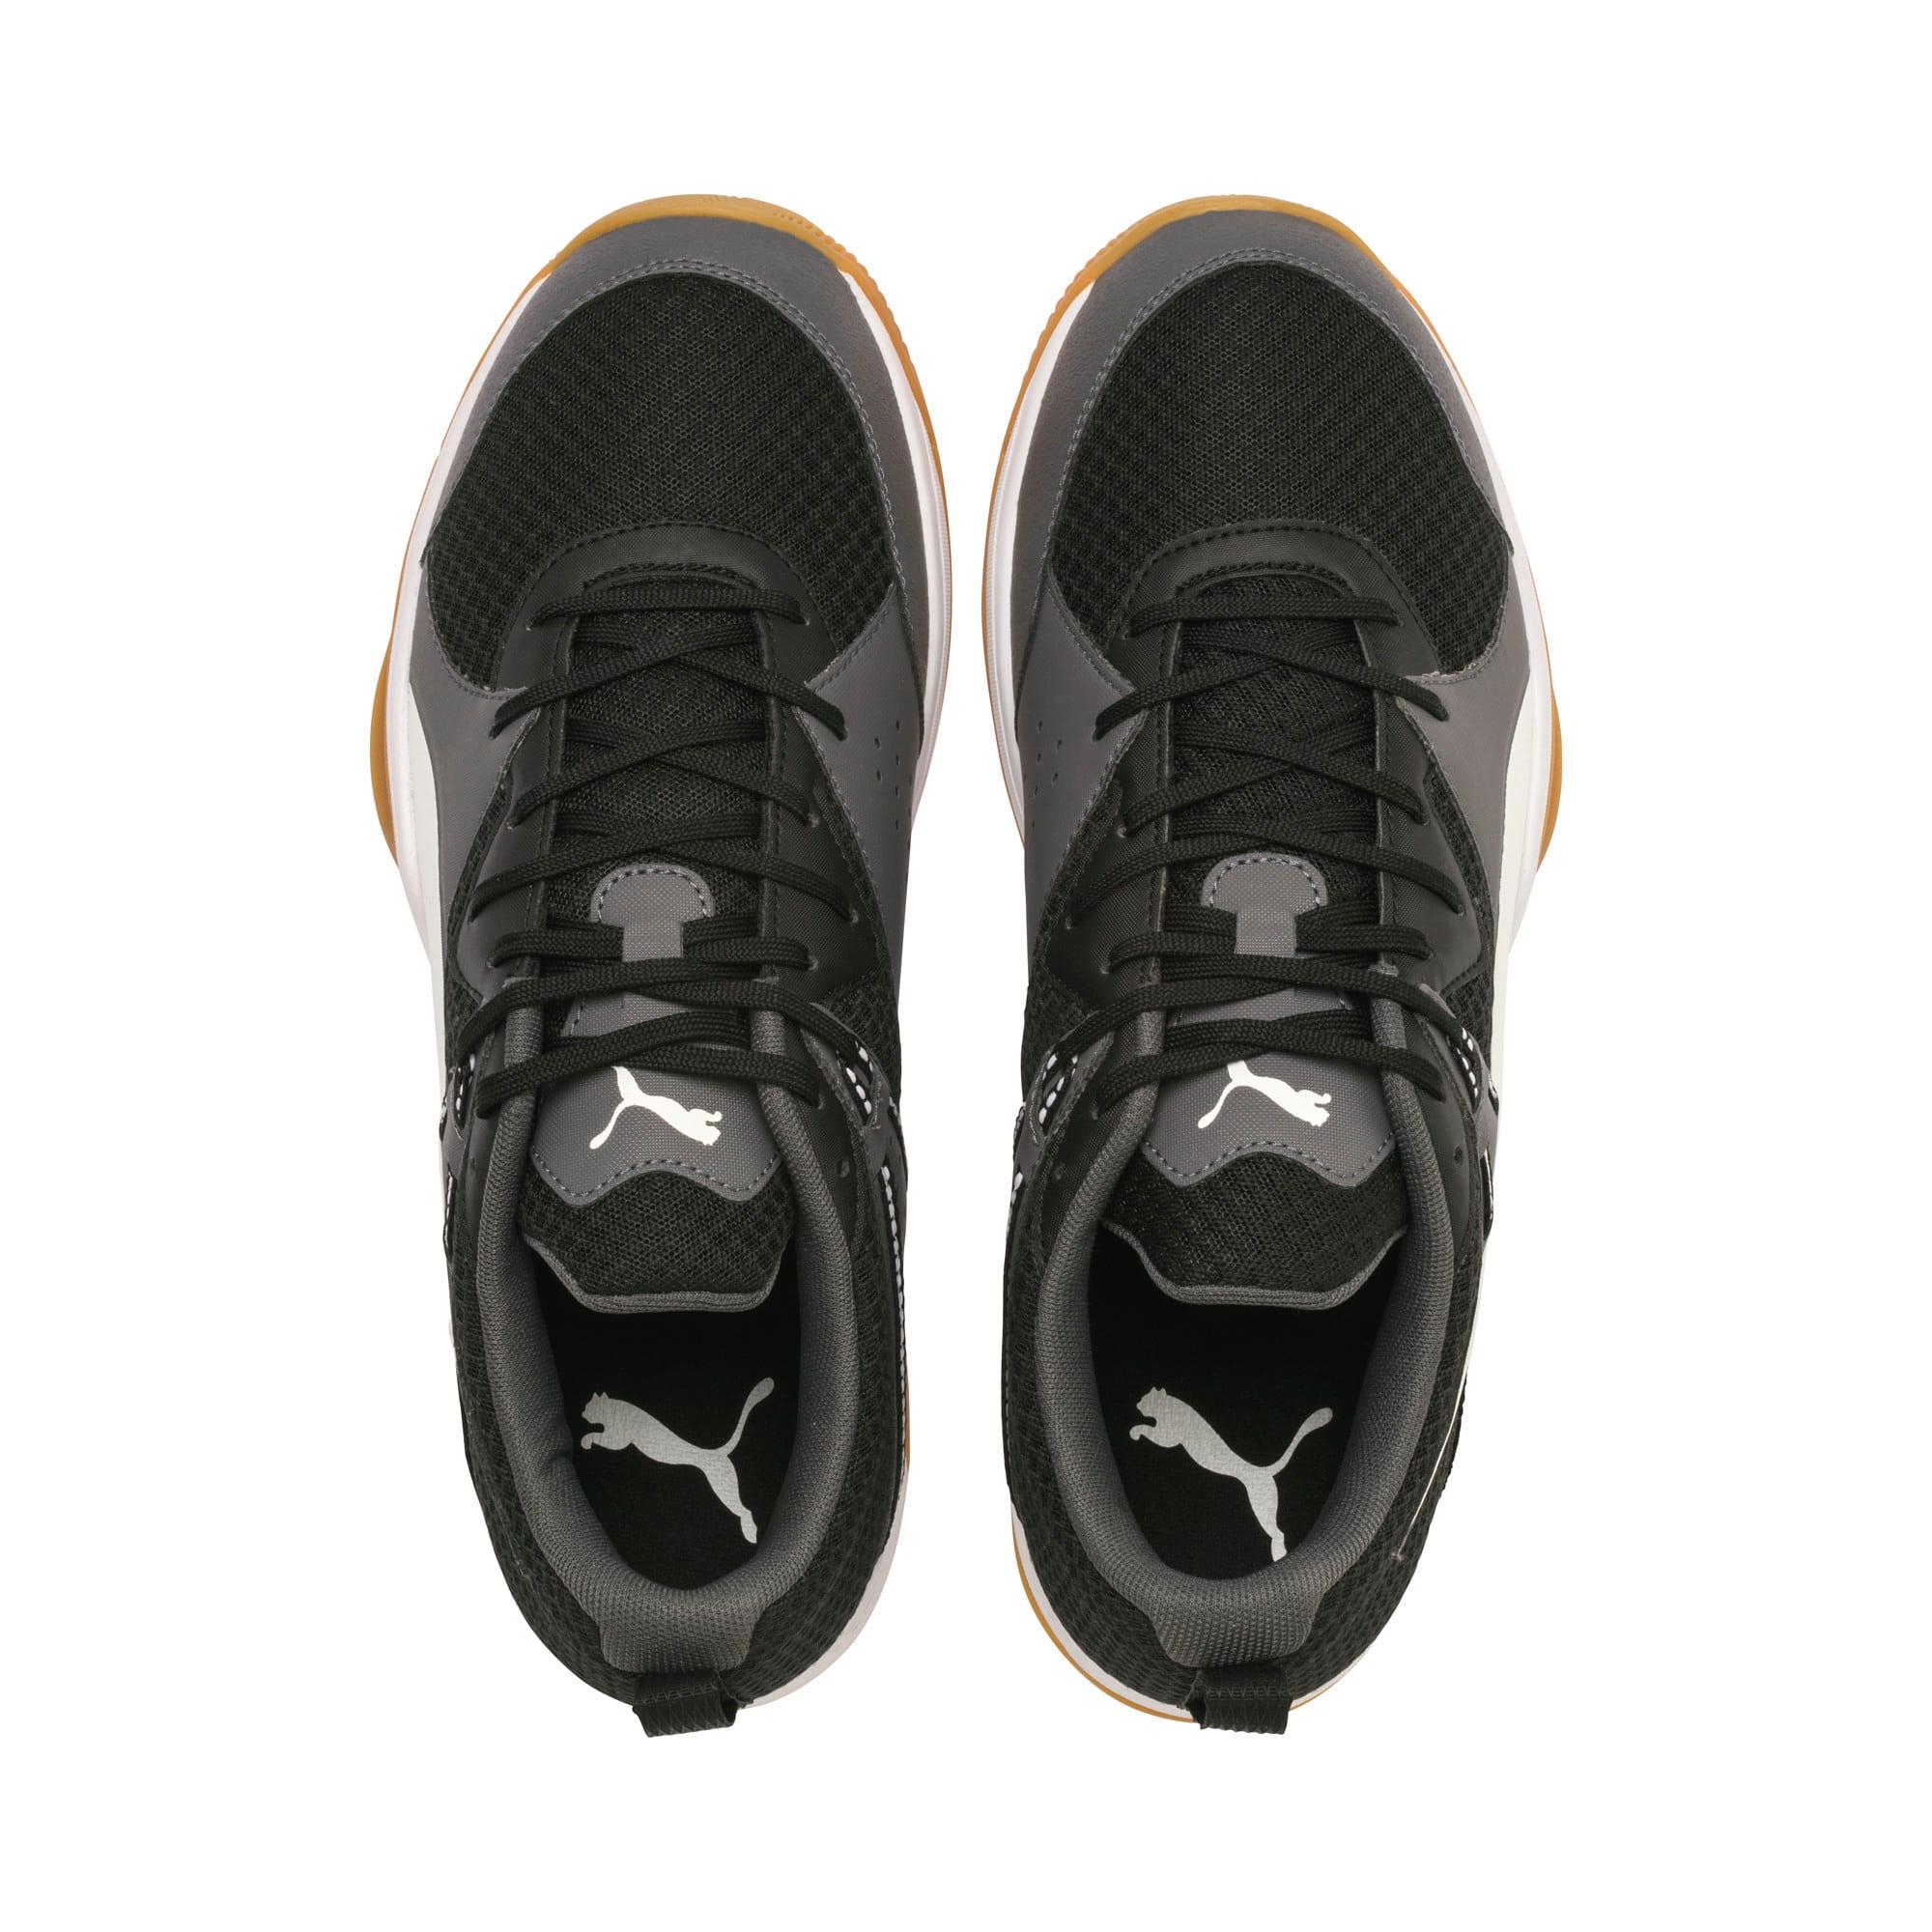 Thumbnail 4 of PUMA Stoker.18 Indoor Training Shoes, Black-White-Iron Gate-Gum, medium-IND